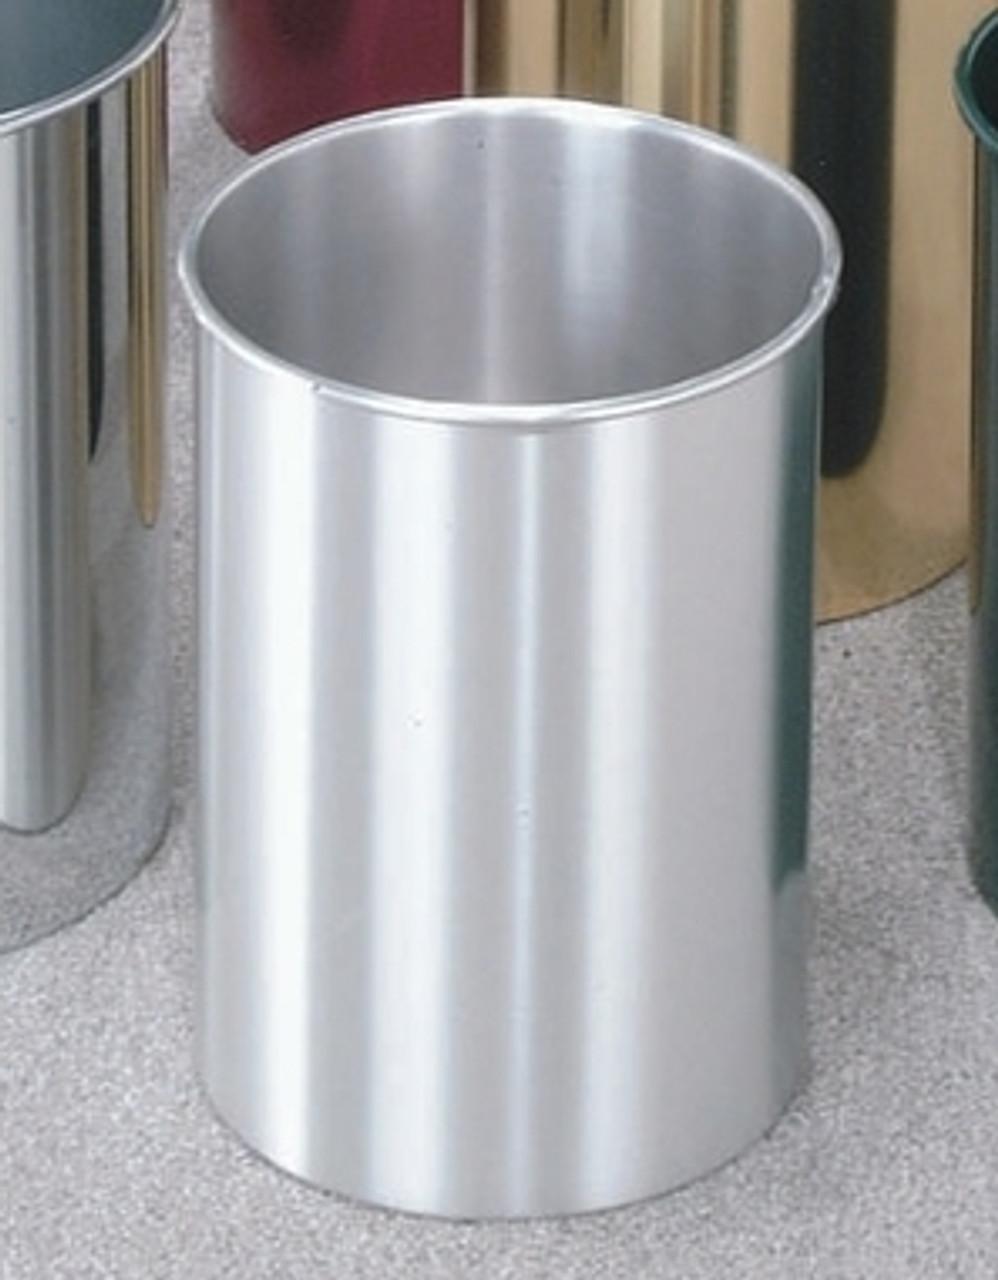 5 Gallon 10 x 15 Open Top Home Office Wastebasket Satin Aluminum